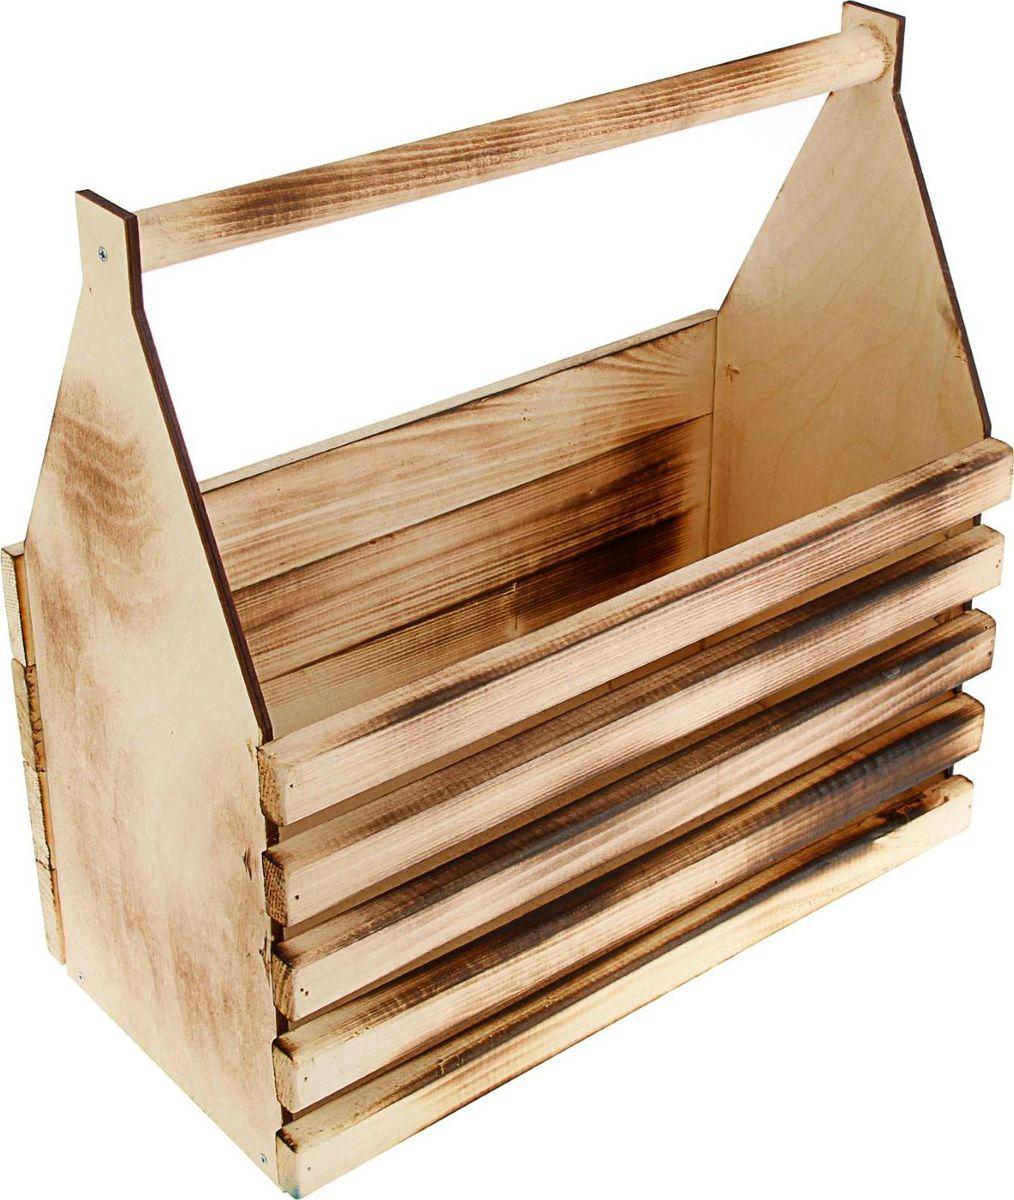 Кашпо ТД ДМ Ящик для инструментов, обожженный, 40 х 40 х 20 см кашпо тд дм ящик любовь флористическое 20 х 16 х 9 5 см